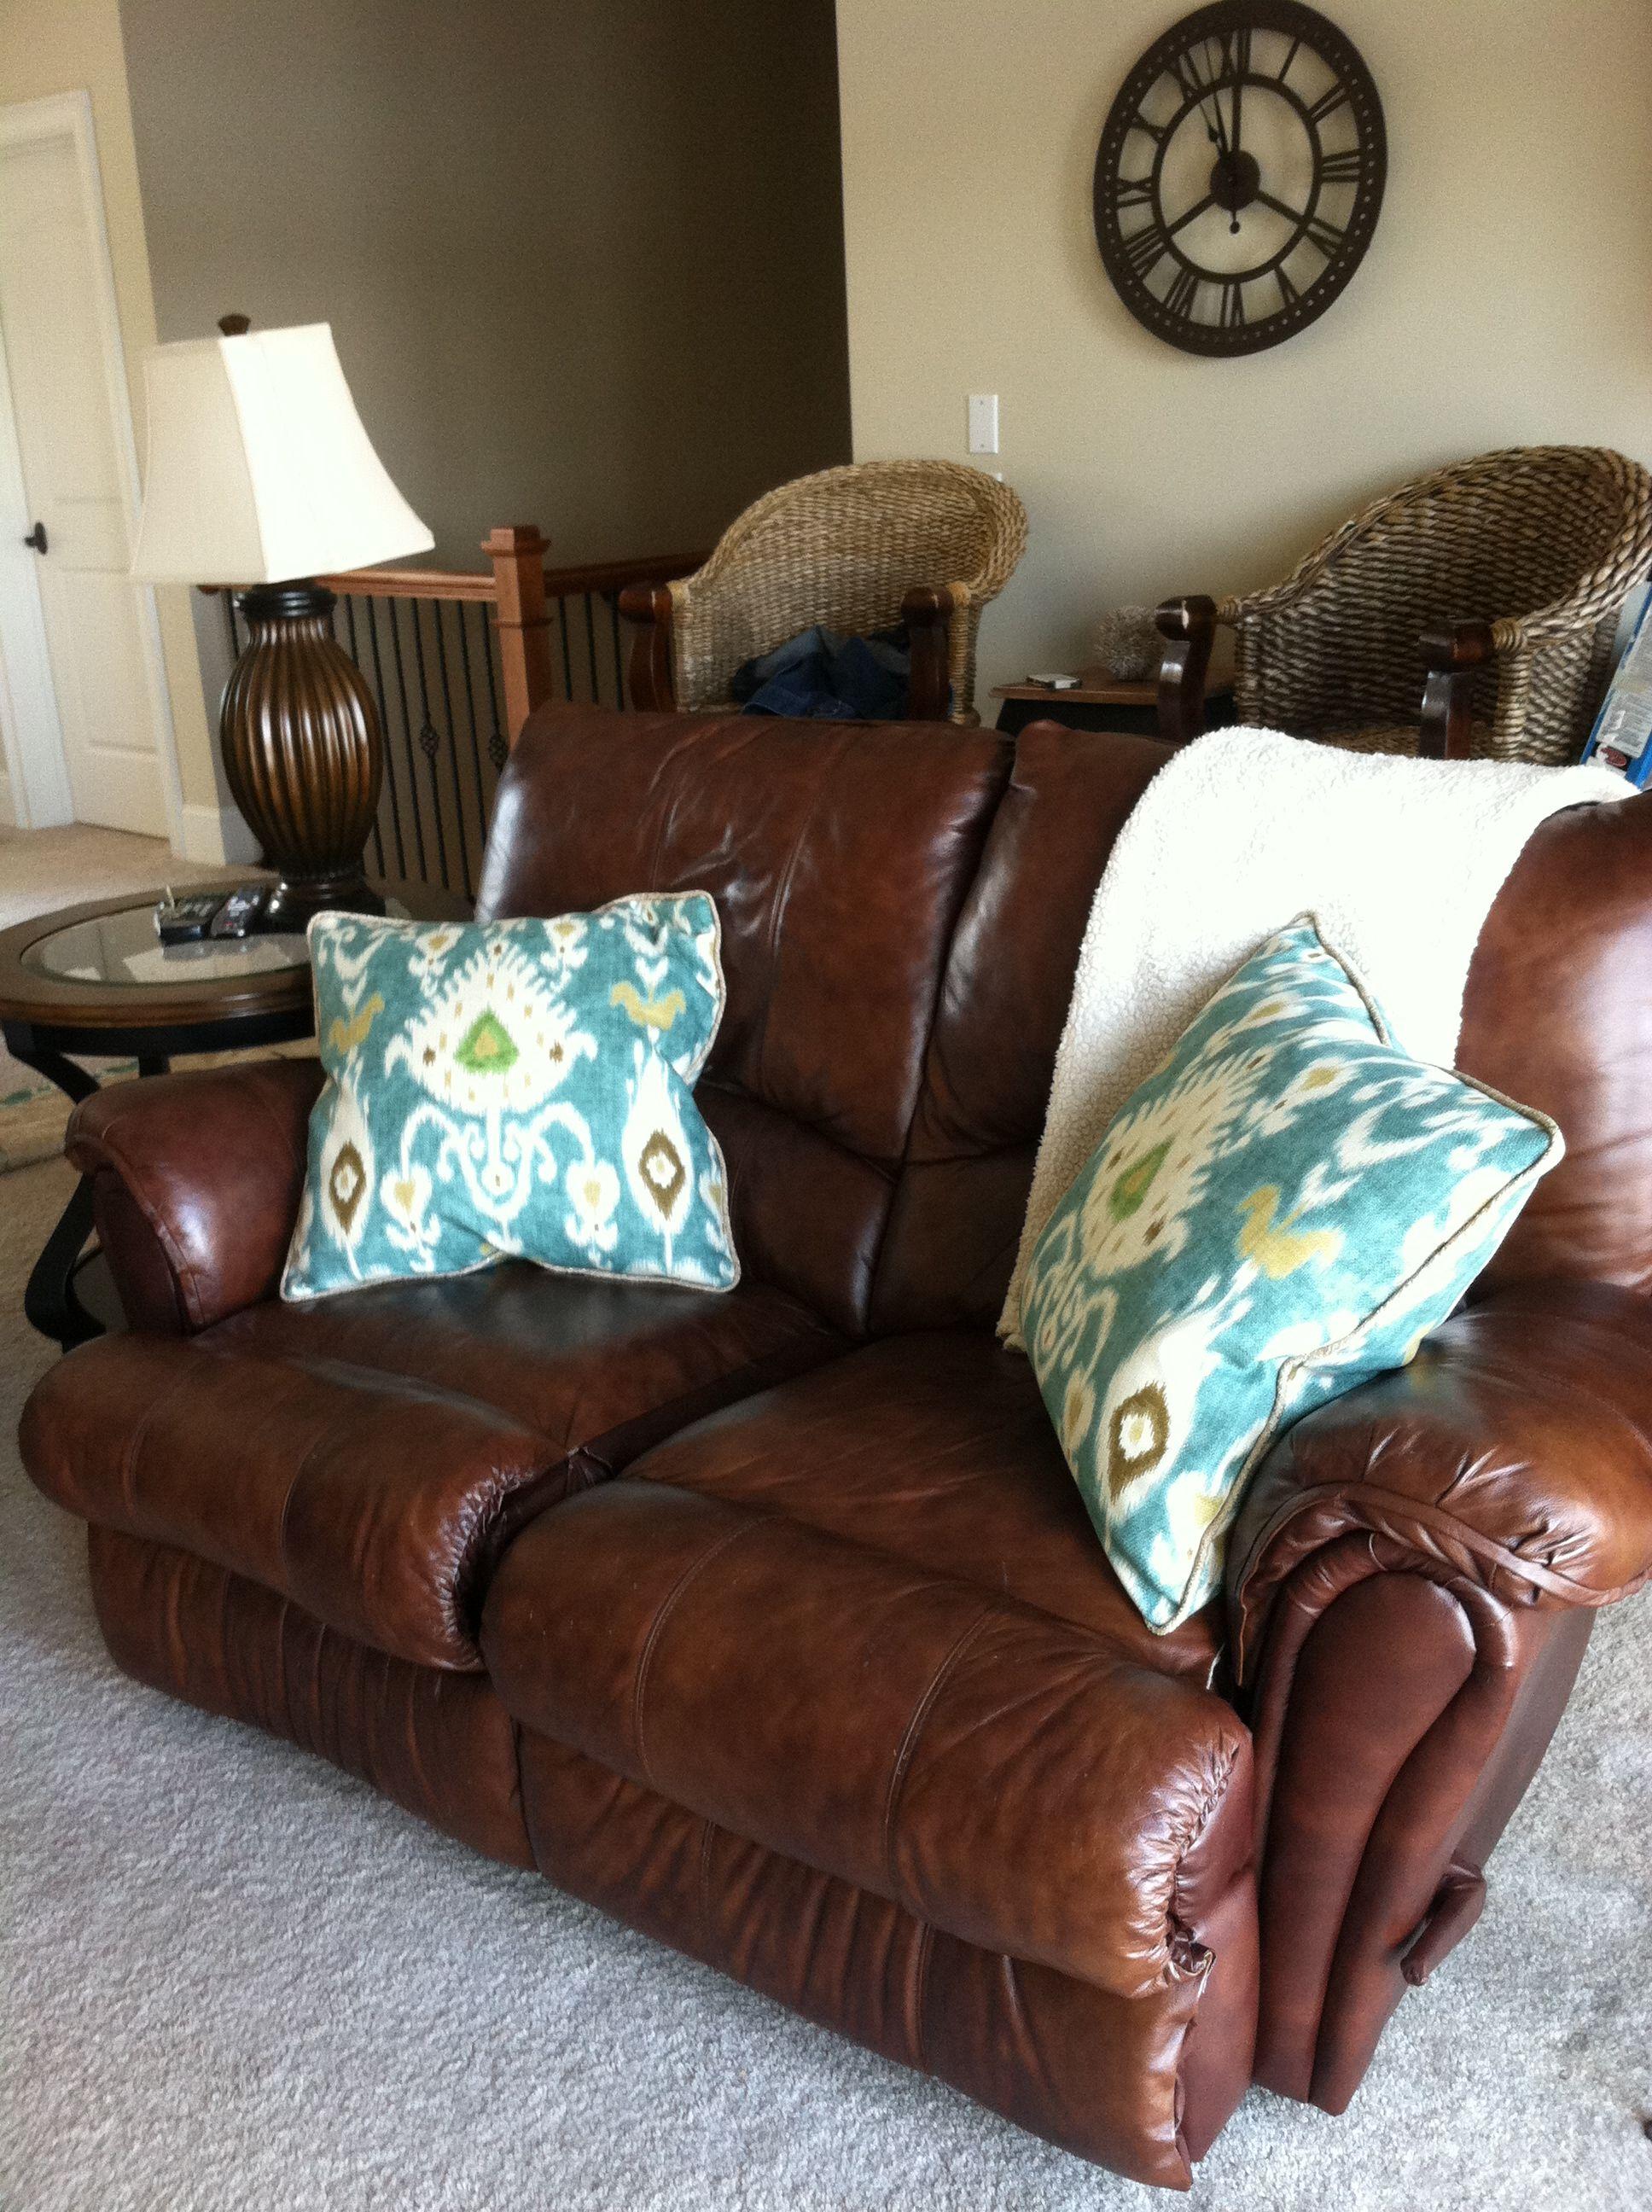 Custom Throw Pillows Designed By Laurel Home Furnishings In Richmond Hill Ga